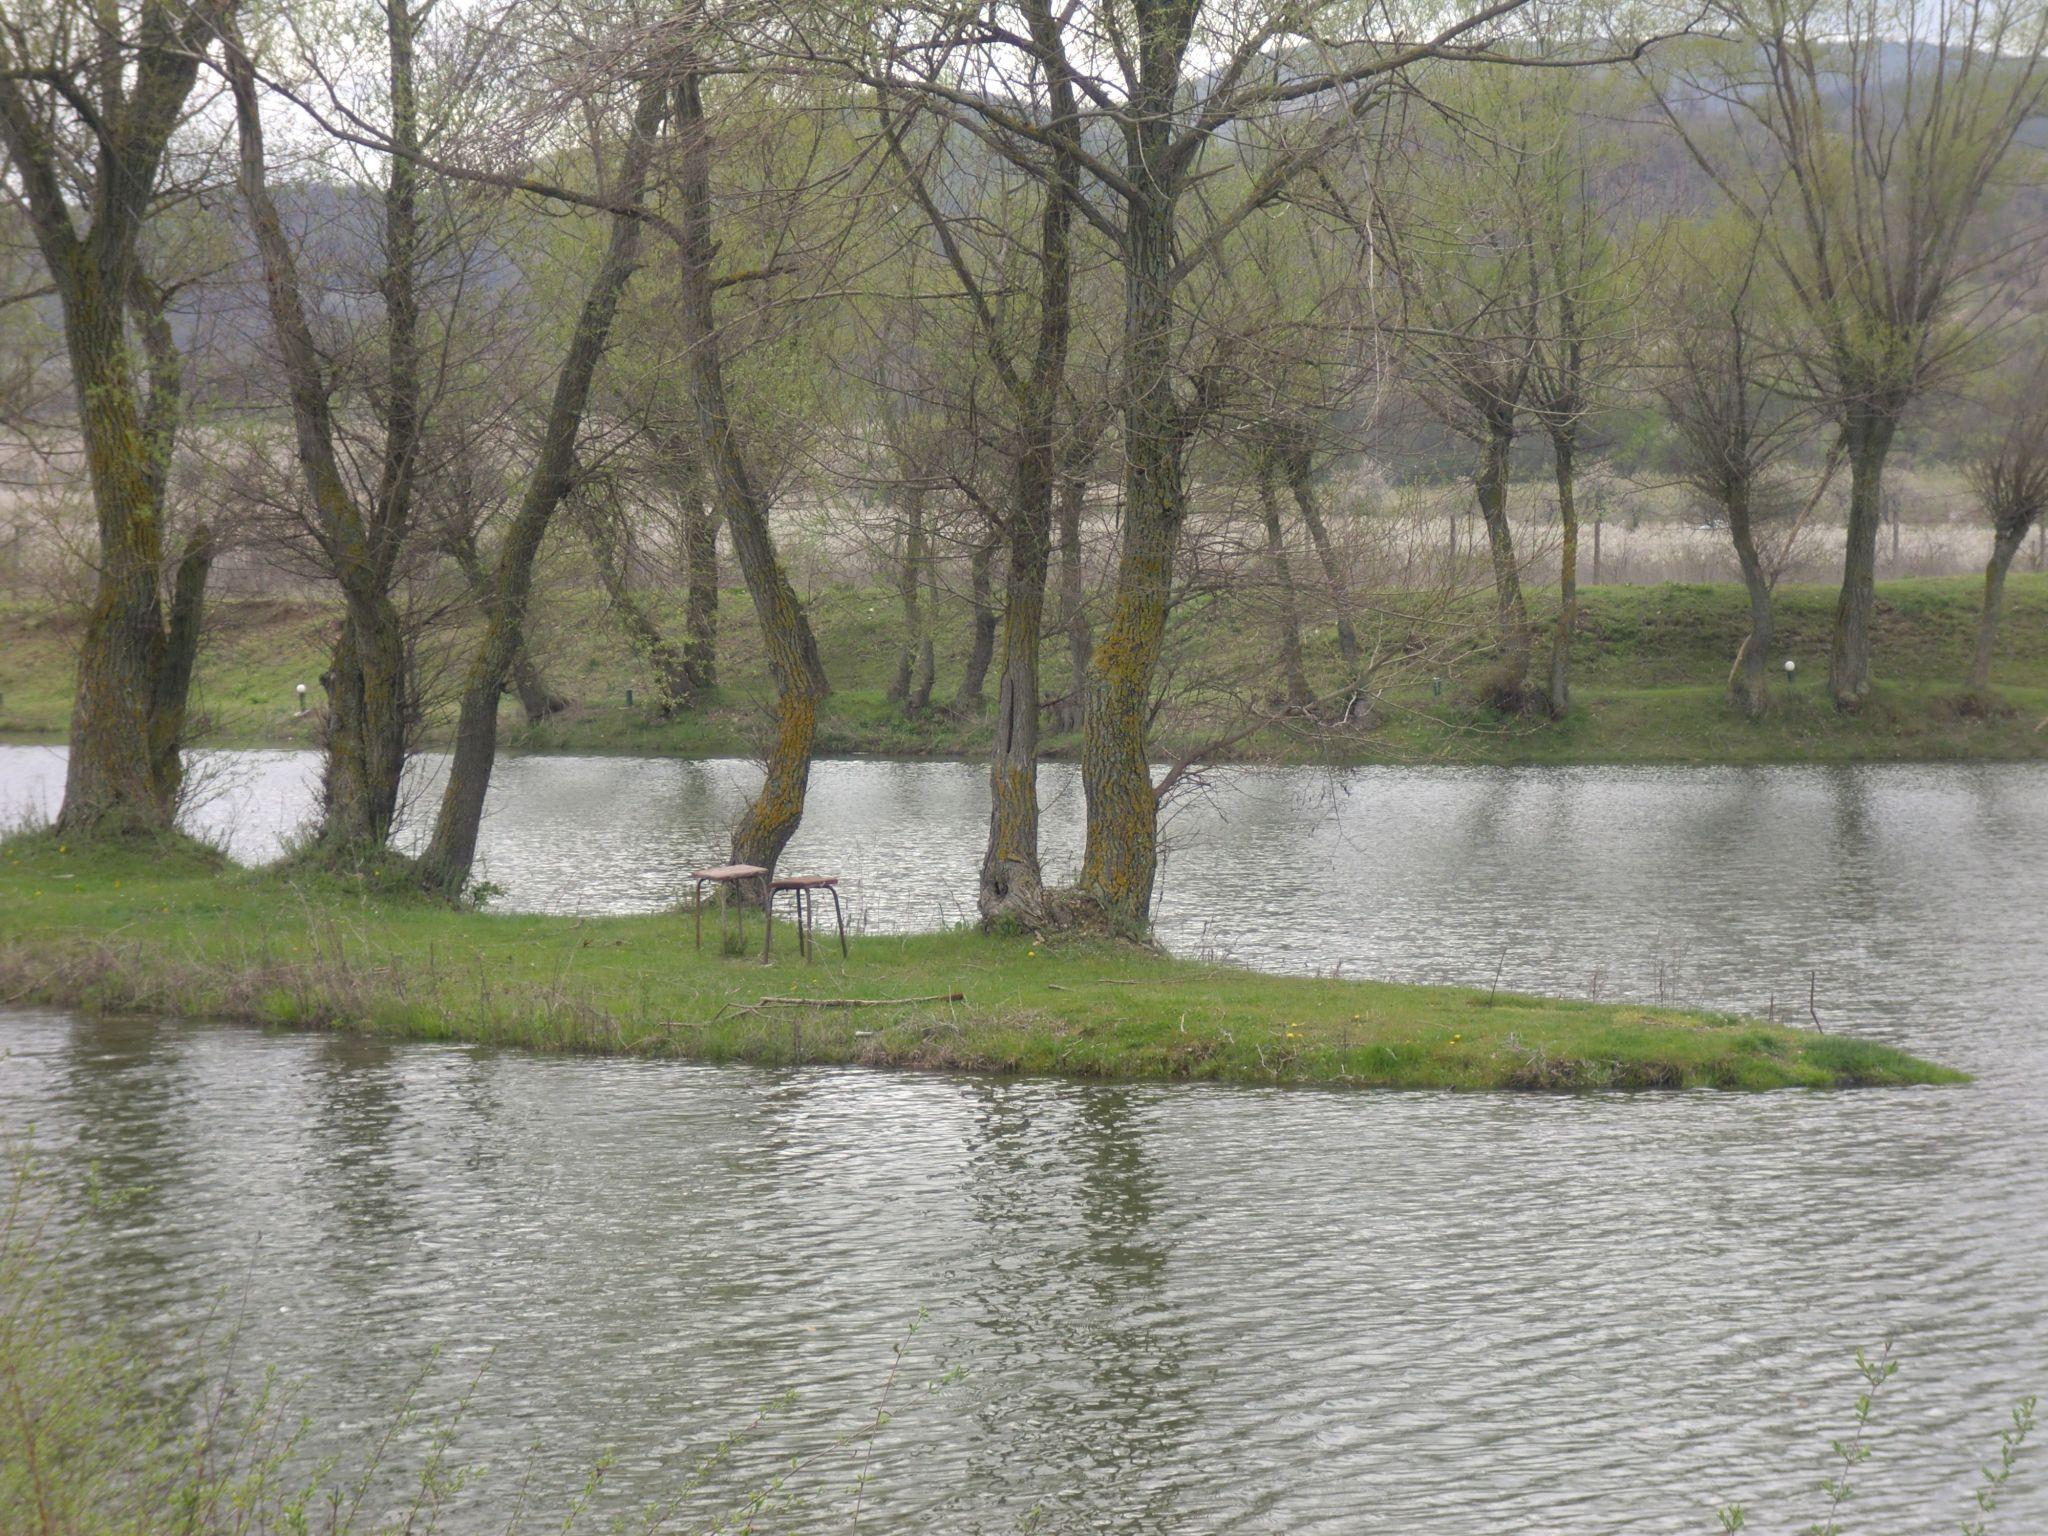 CIMG4371 - Macedonian landscapes